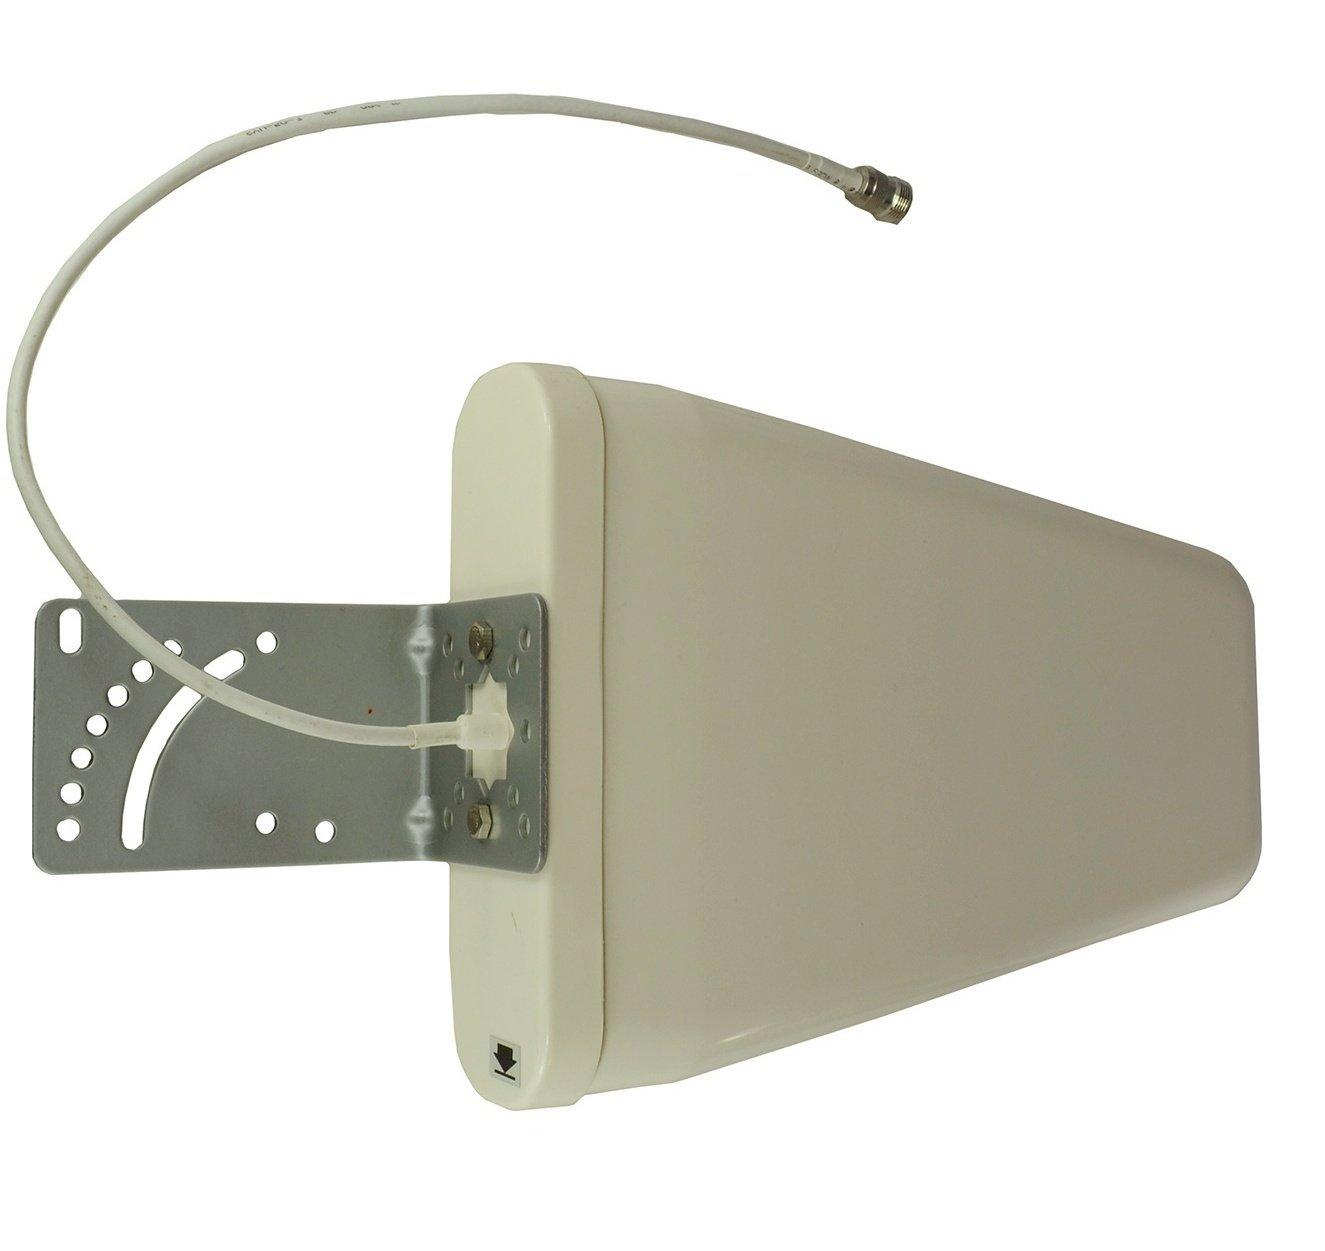 Proxicast 11 dBi Yagi High Gain 3G / 4G / LTE / xLTE / Wi-Fi Universal Fixed Mount Directional Antenna (700-2700 MHz)